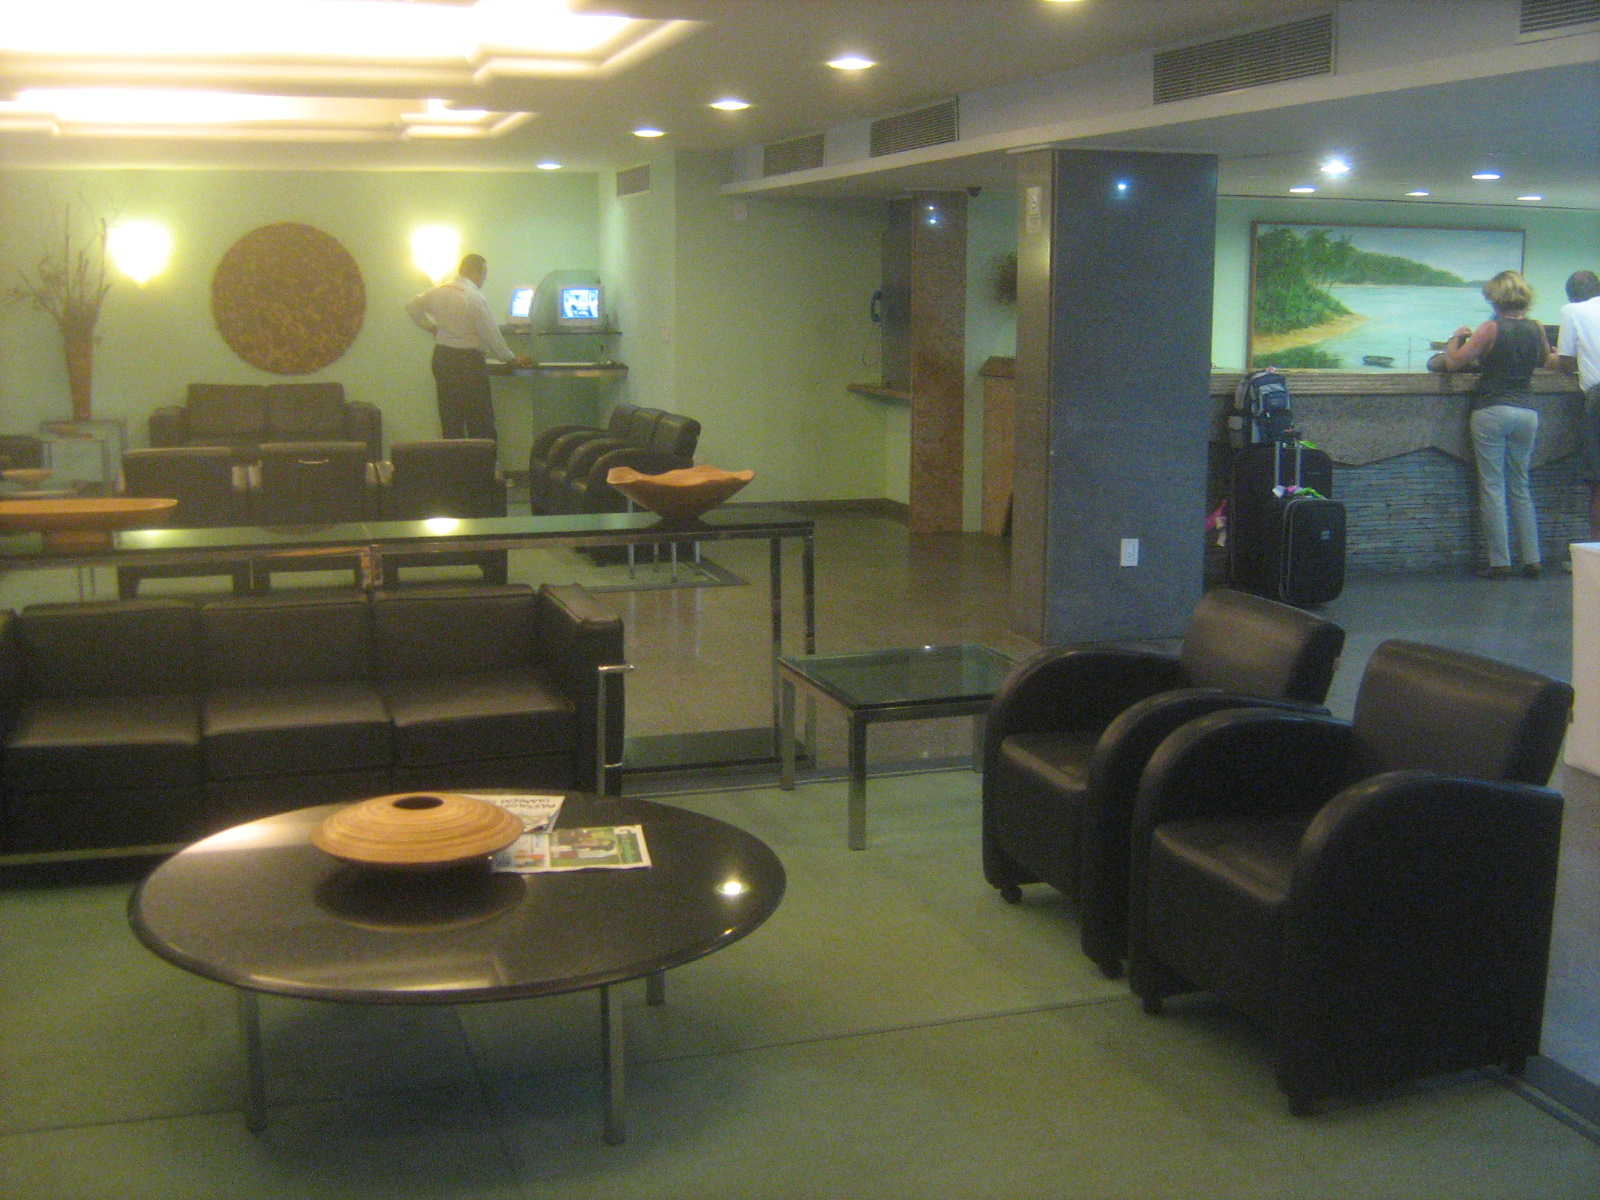 VIAJANTE ESPECIAL: Hotel Marante Recife PE #978A34 1600 1200